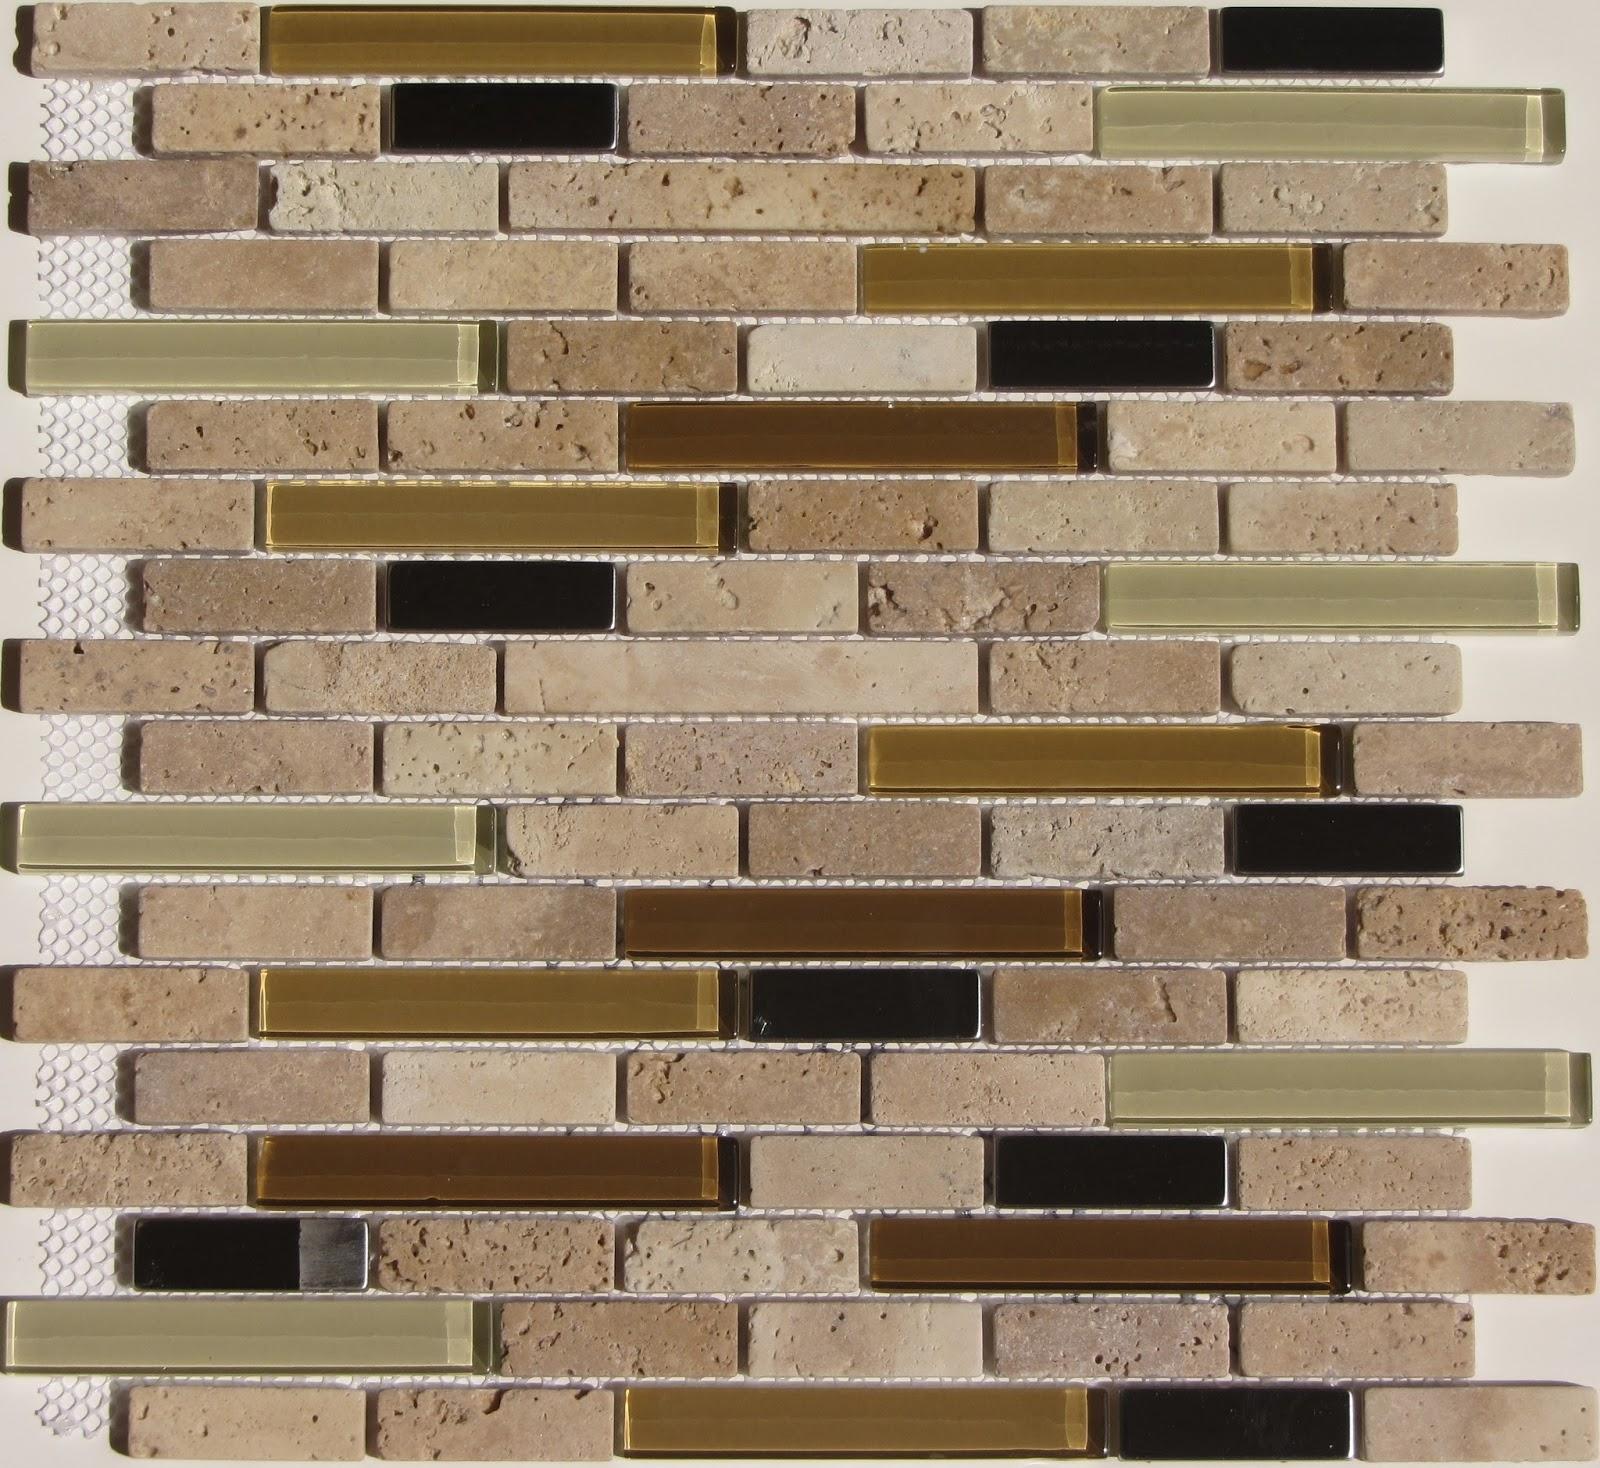 Peel and Stick Tile | Peel and Stick Floor Tile Reviews | Mosaic Tile Backsplash